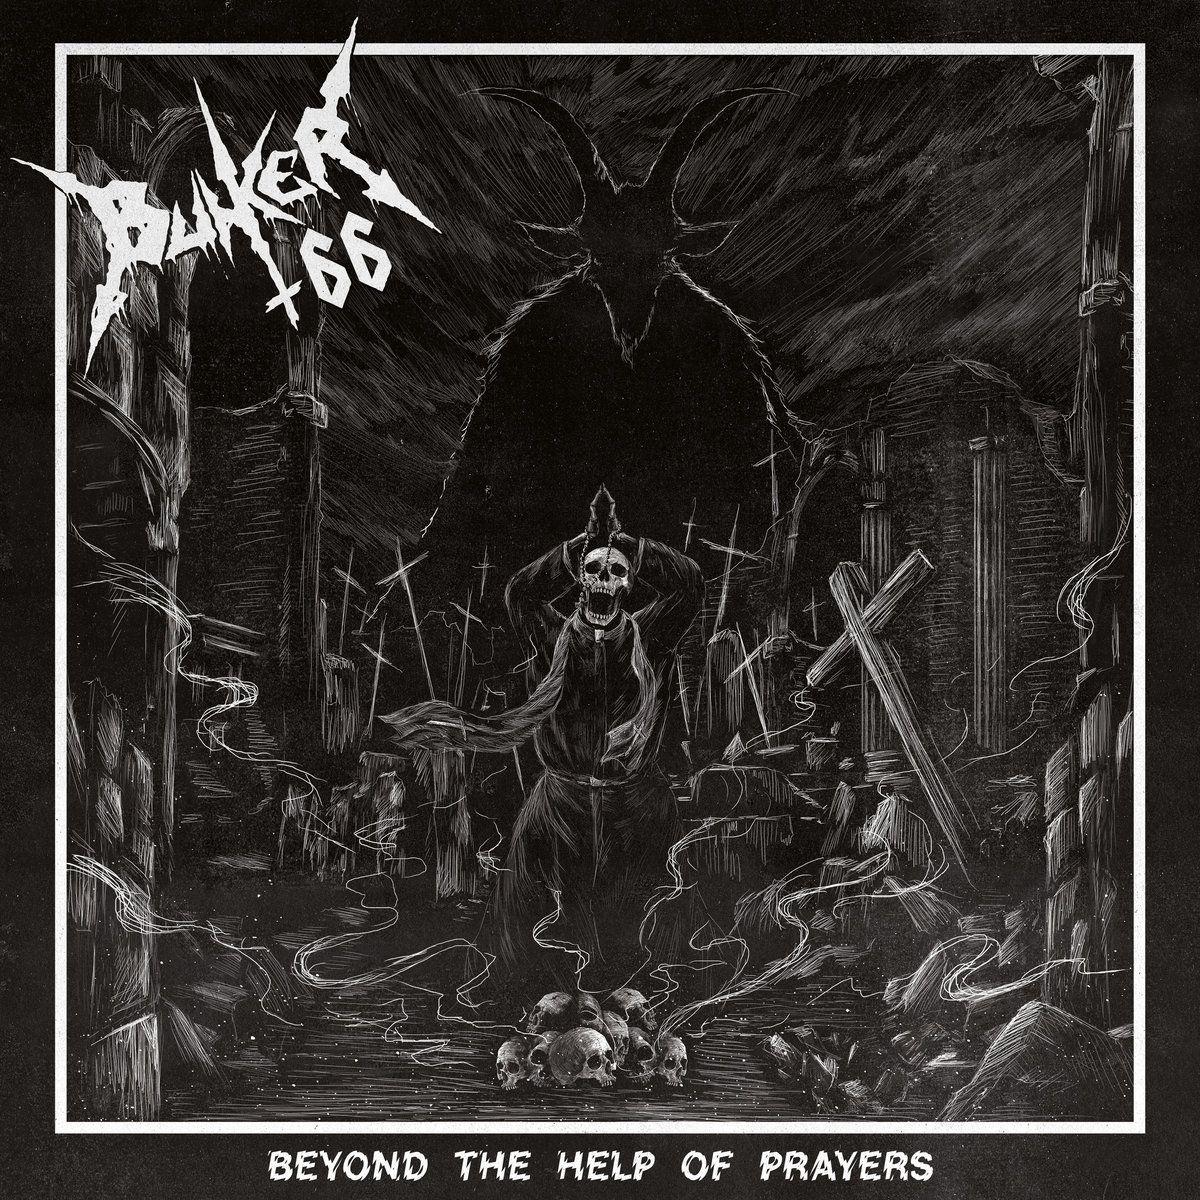 Bunker 66 - Beyond the Help of Prayers